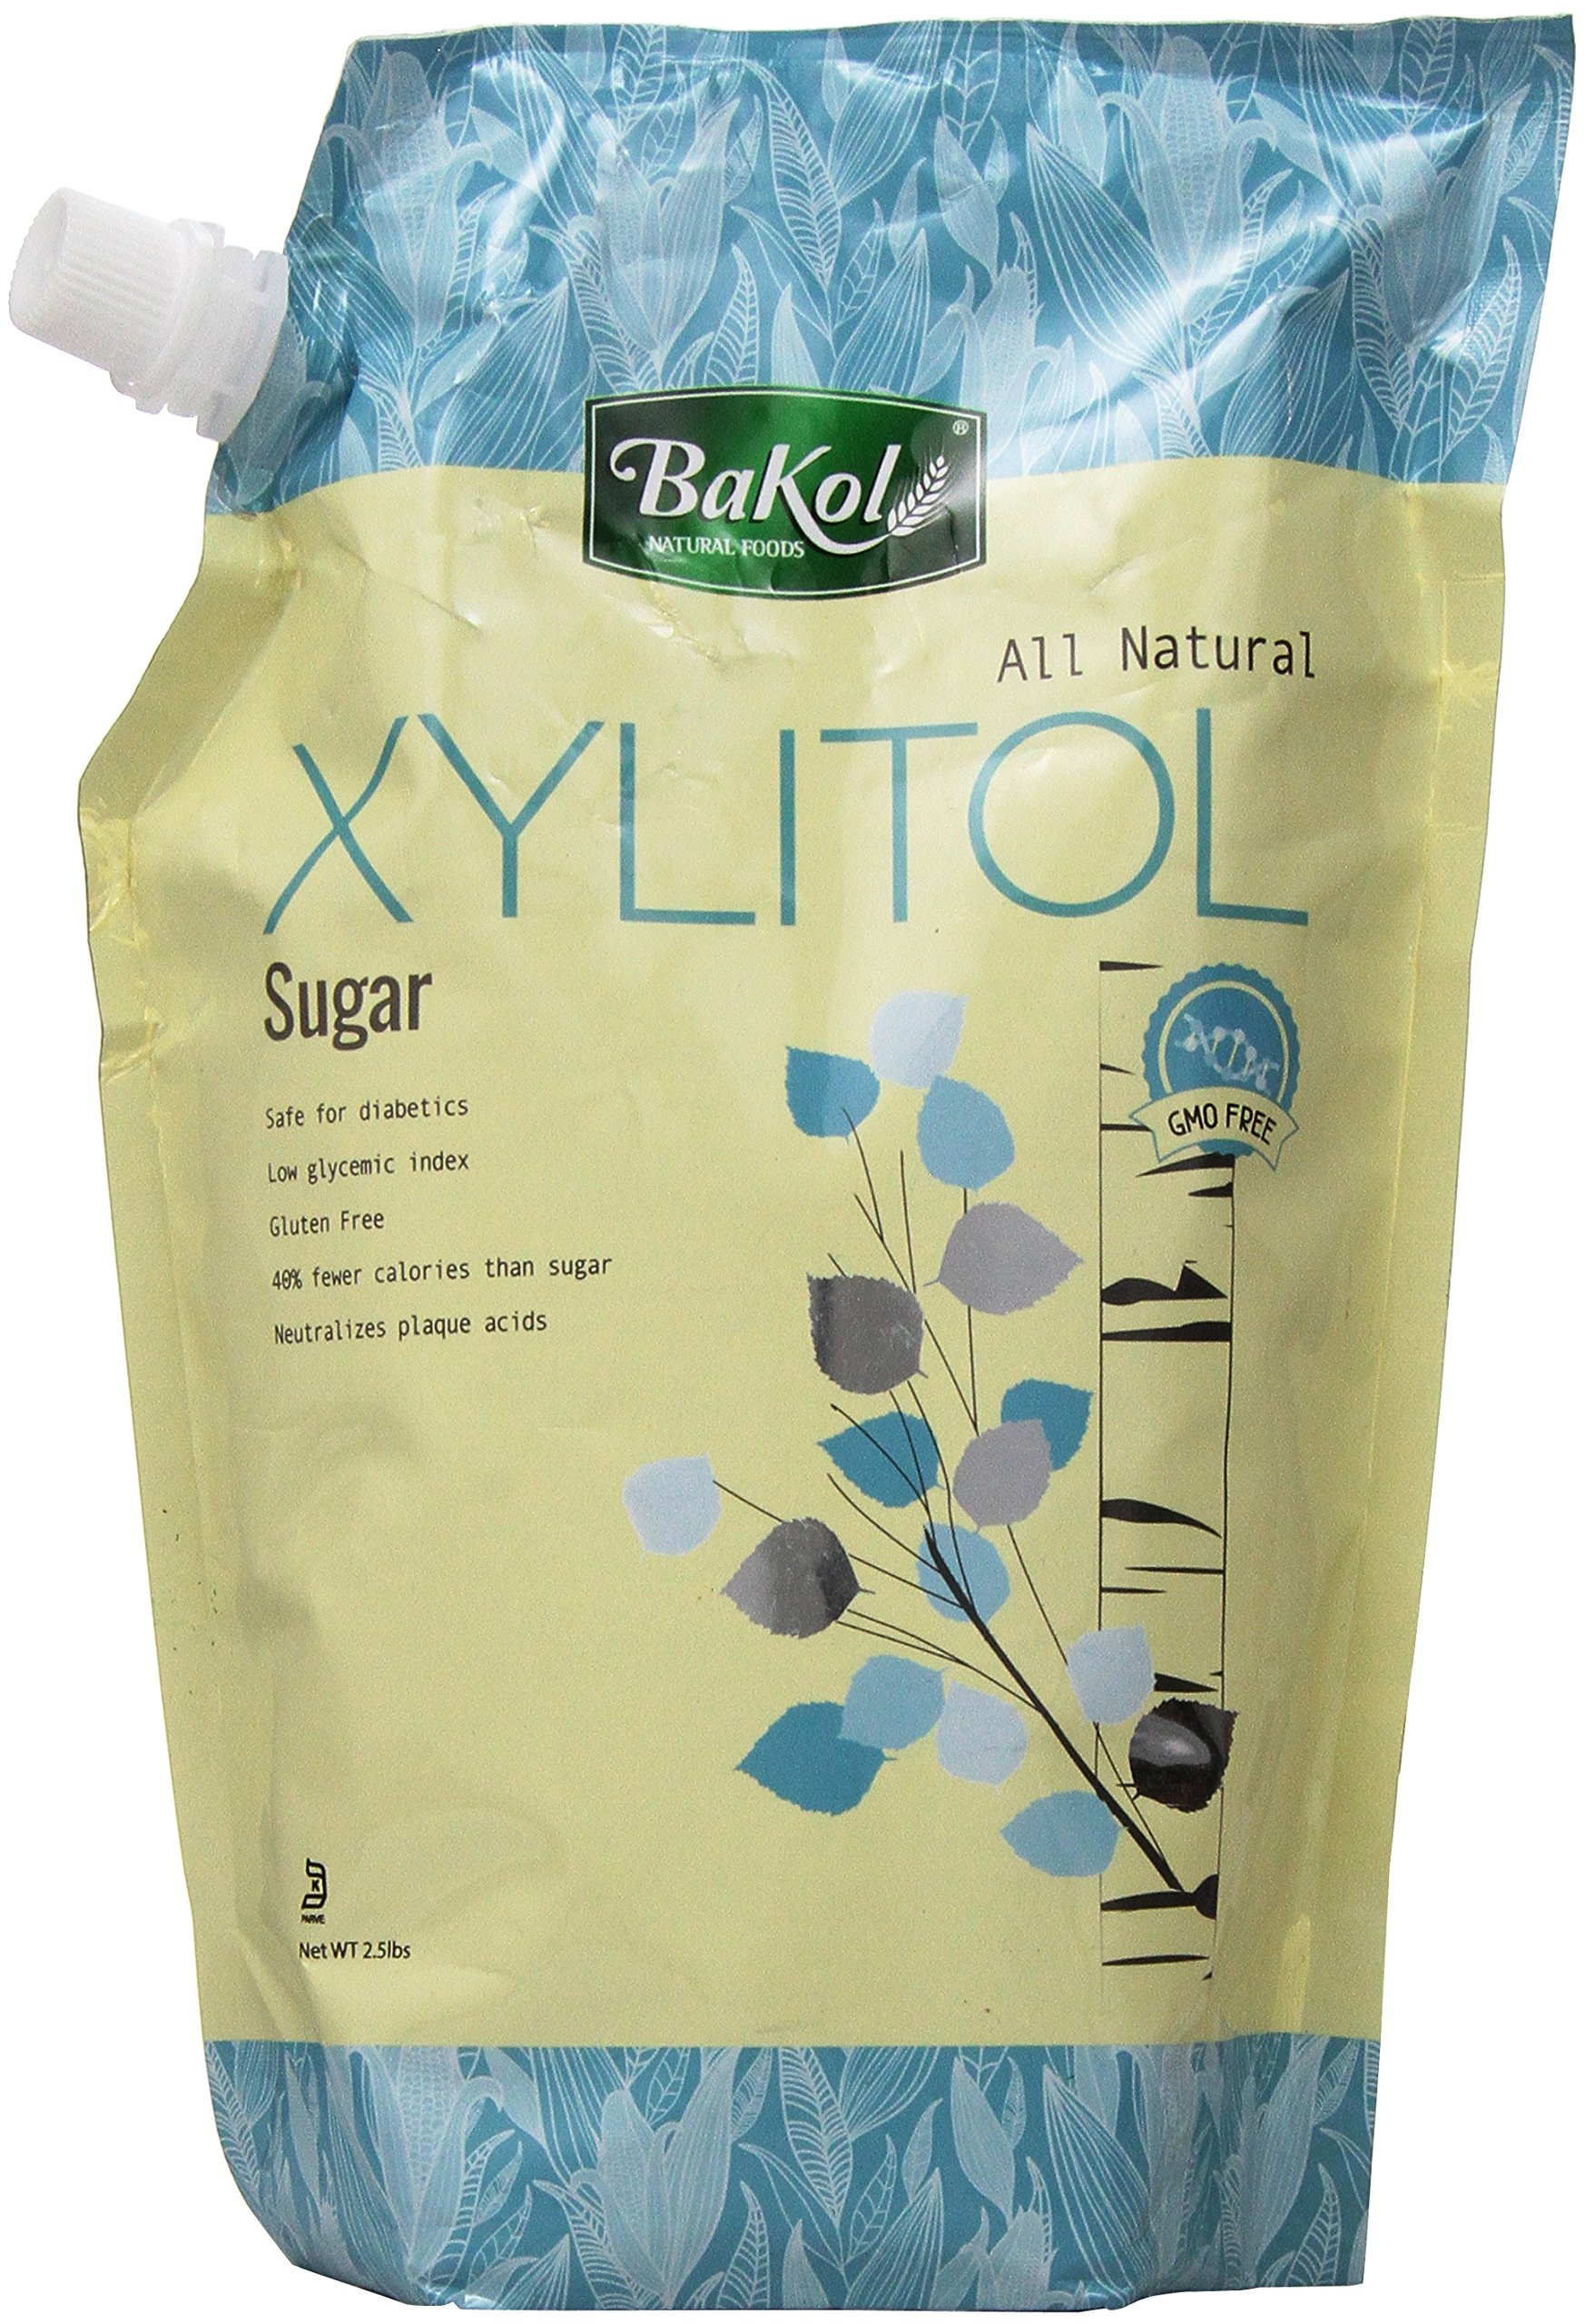 bakol Xylitol Sweetener, 2.5 Pound